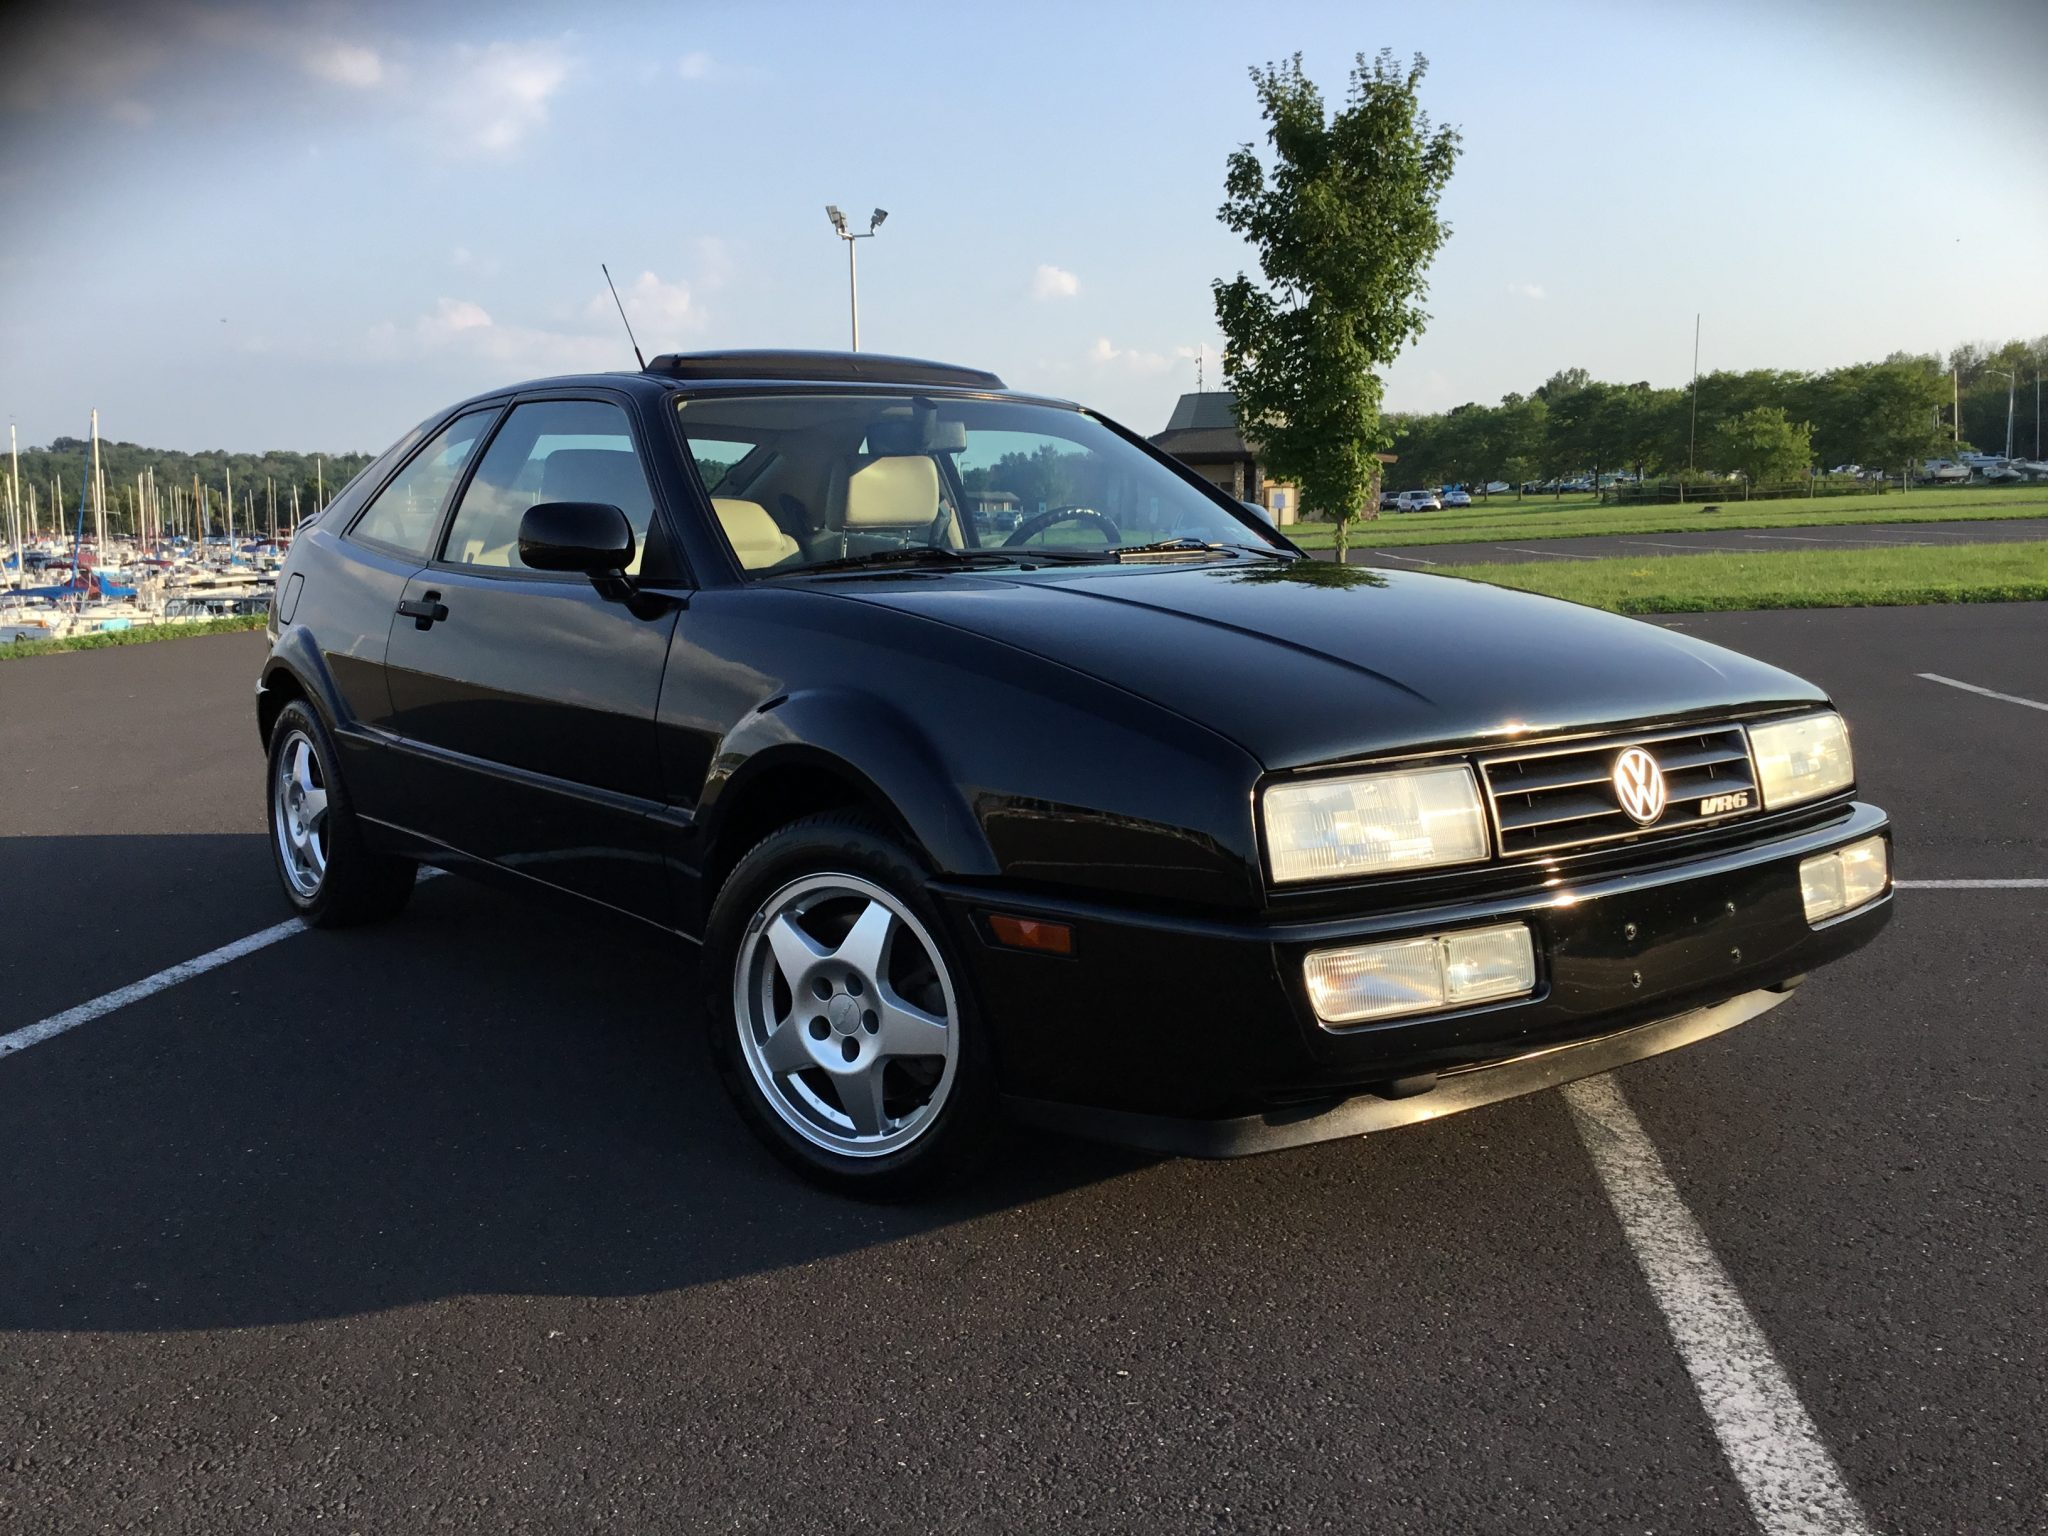 1994_volkswagen_corrado_vr6_1597151569107df3978DC37861-BD01-4B17-8AA8-F003AA8332DF-scaled